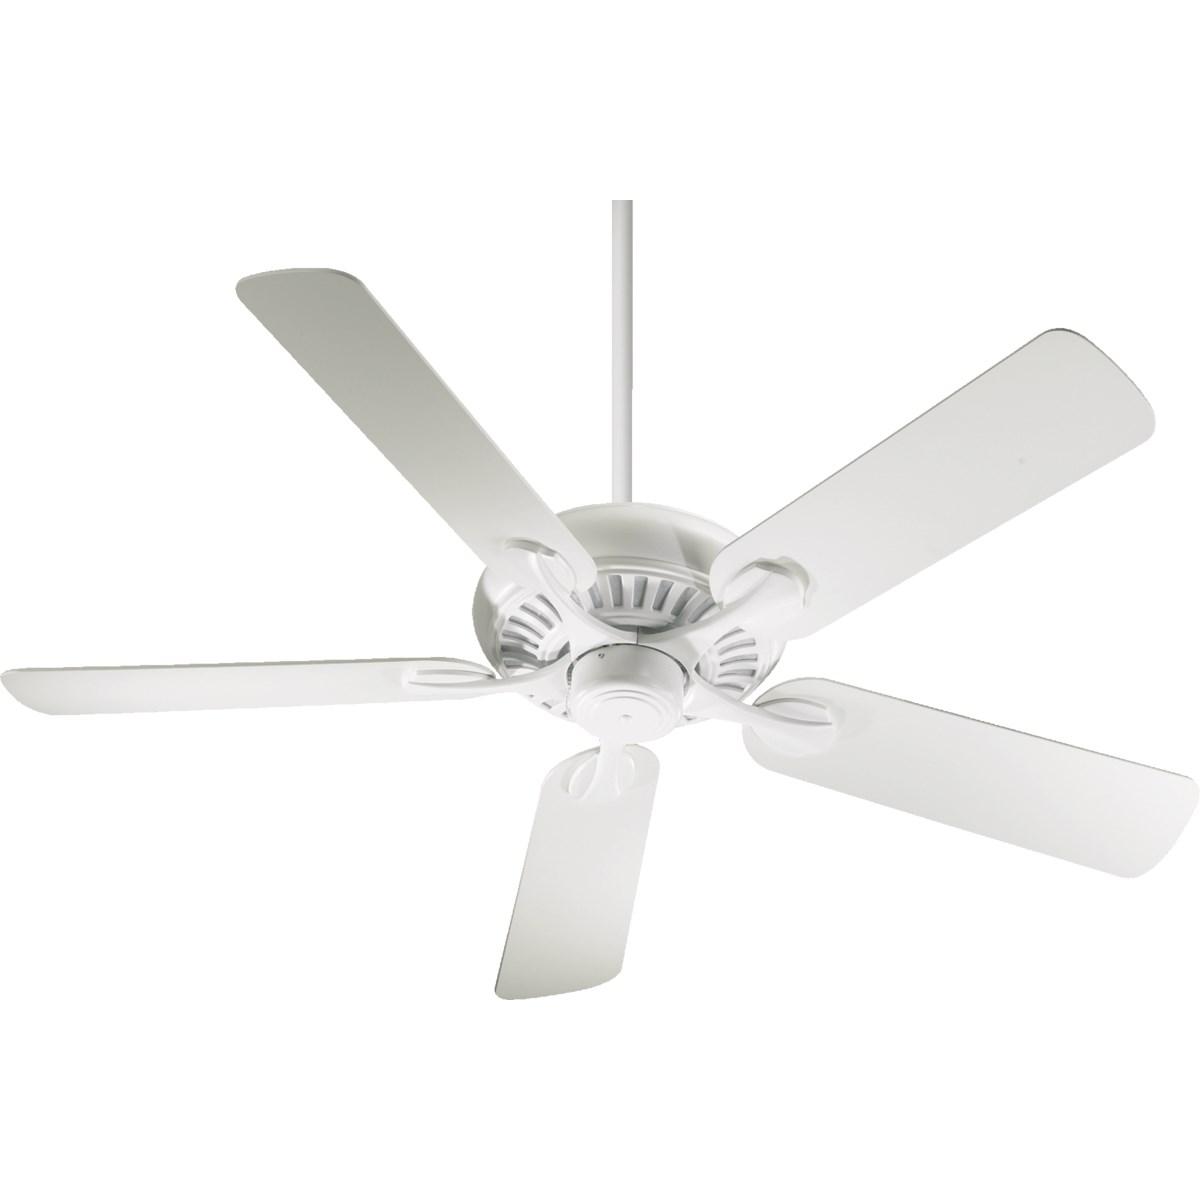 Pinnacle 52-in 5 Blade Studio White Transitional Ceiling Fan